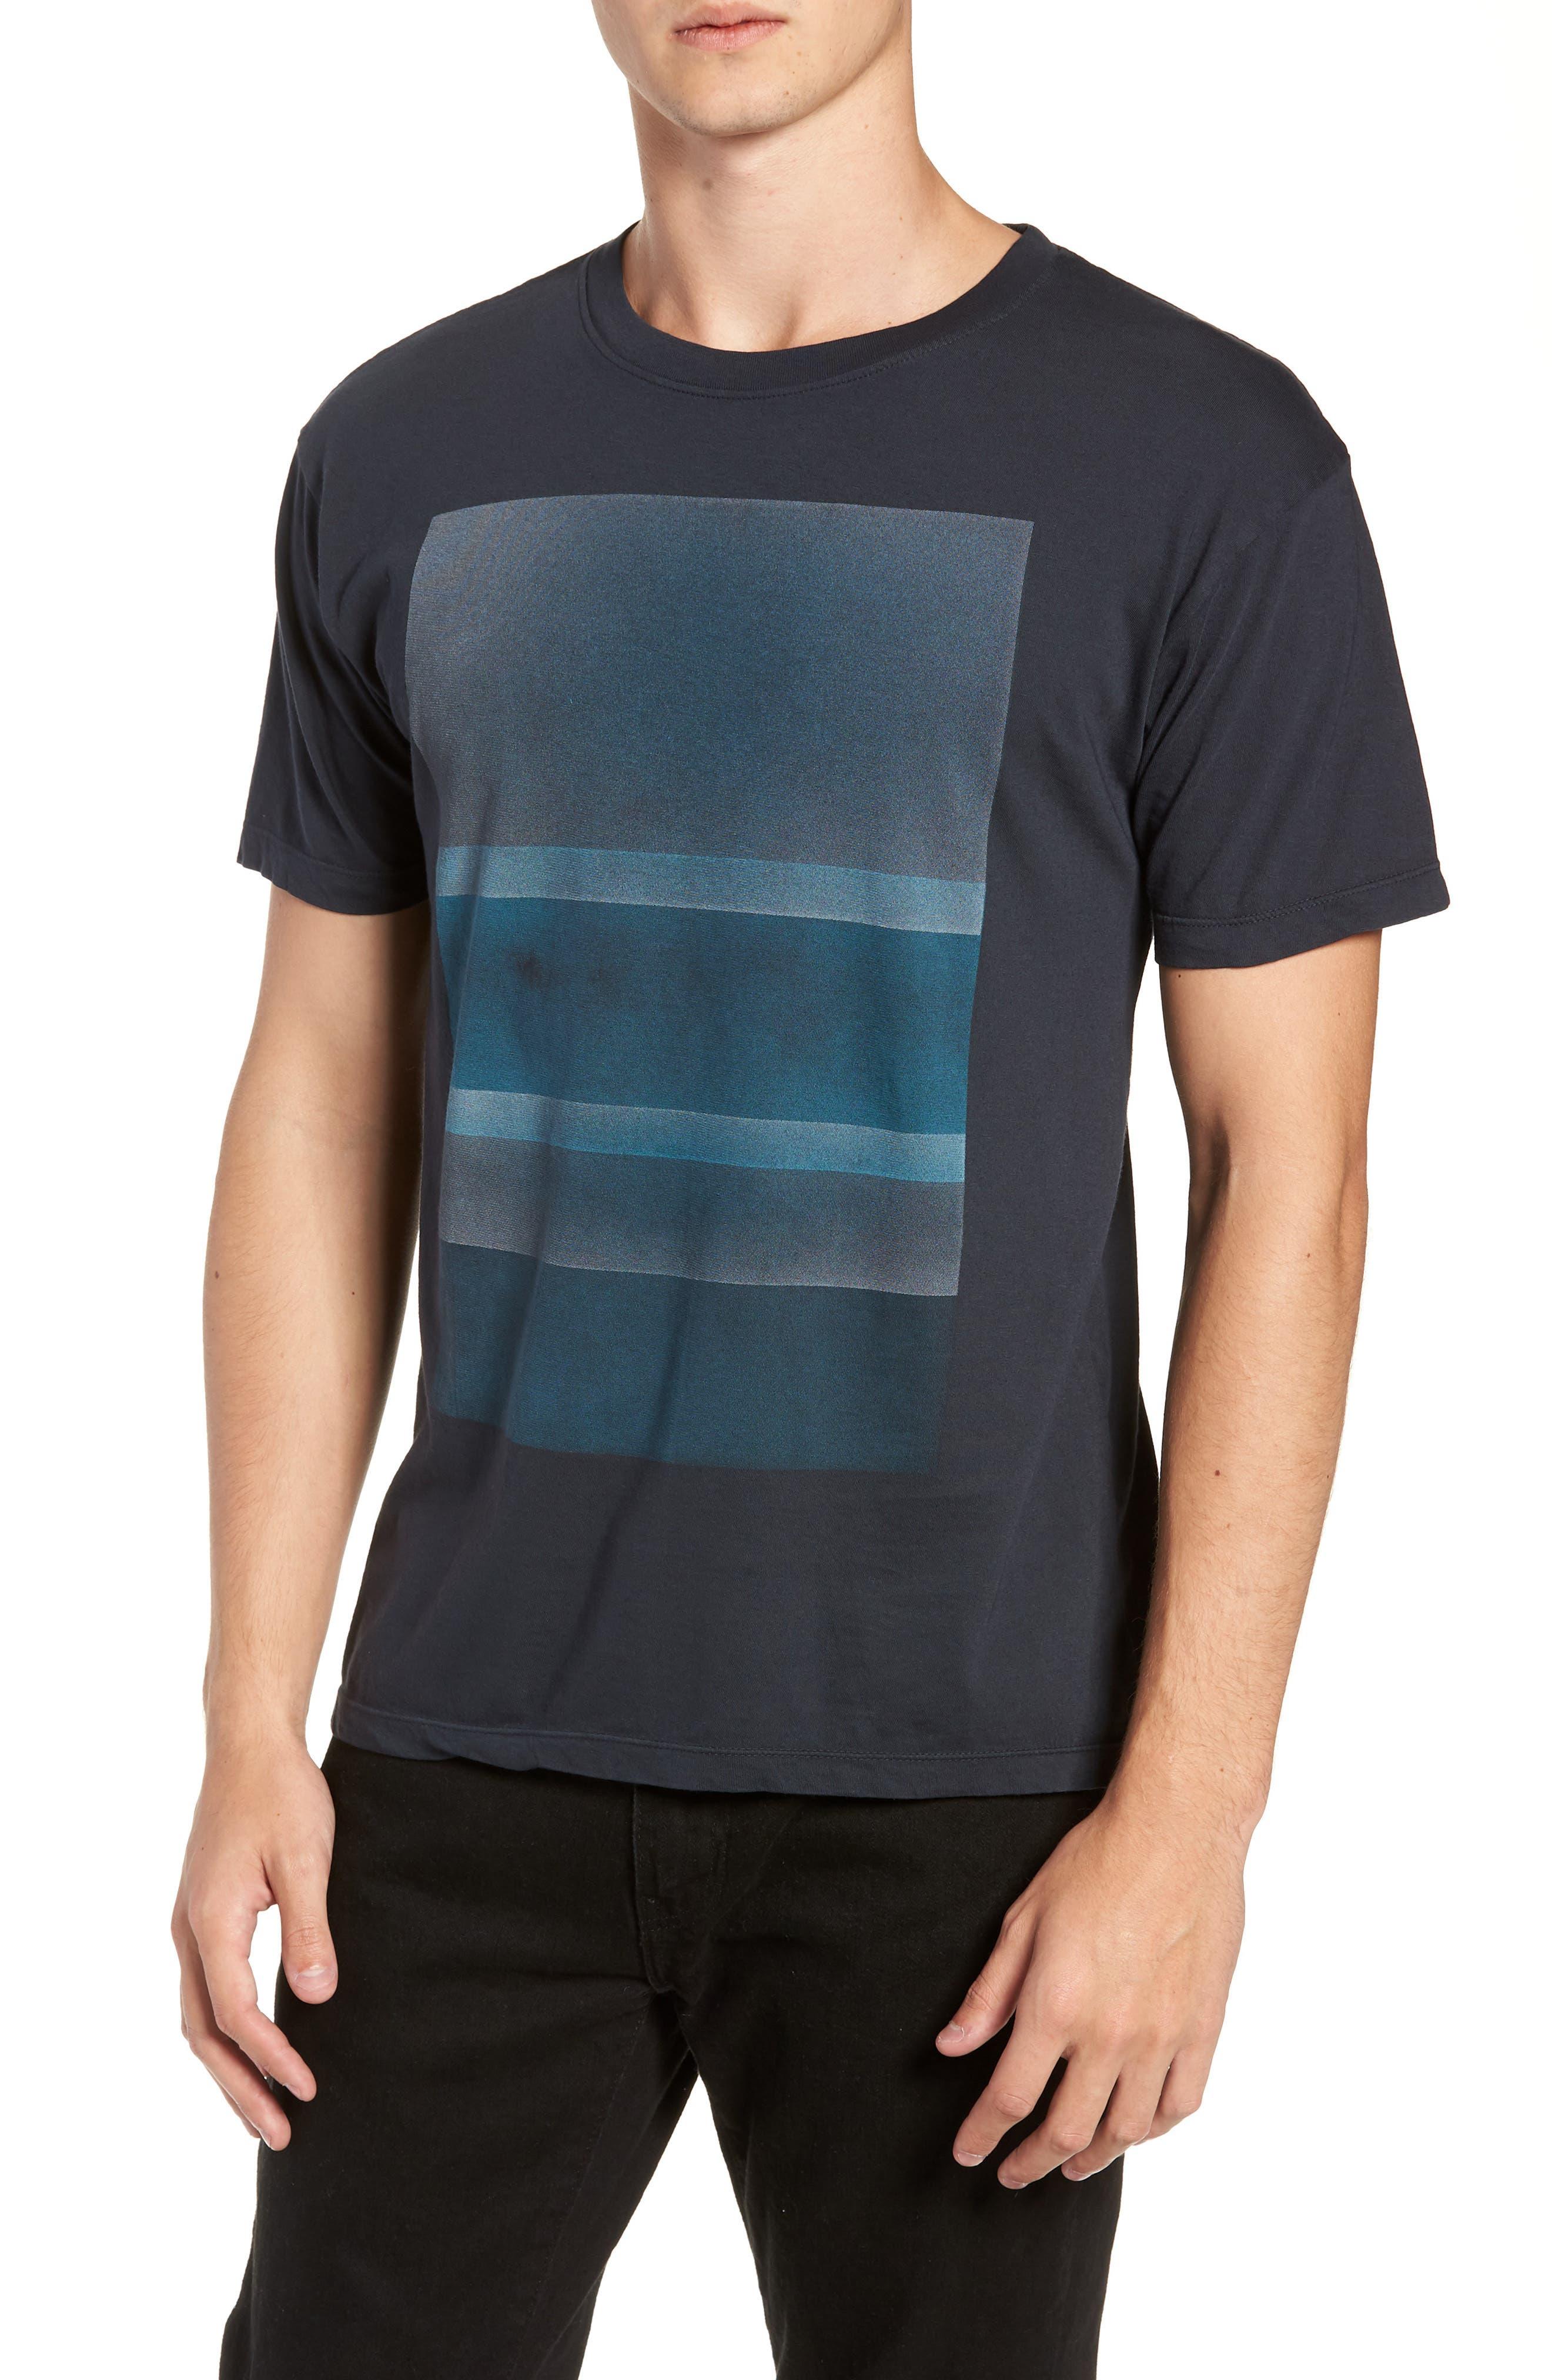 VESTIGE Graphic T-Shirt in Carbon